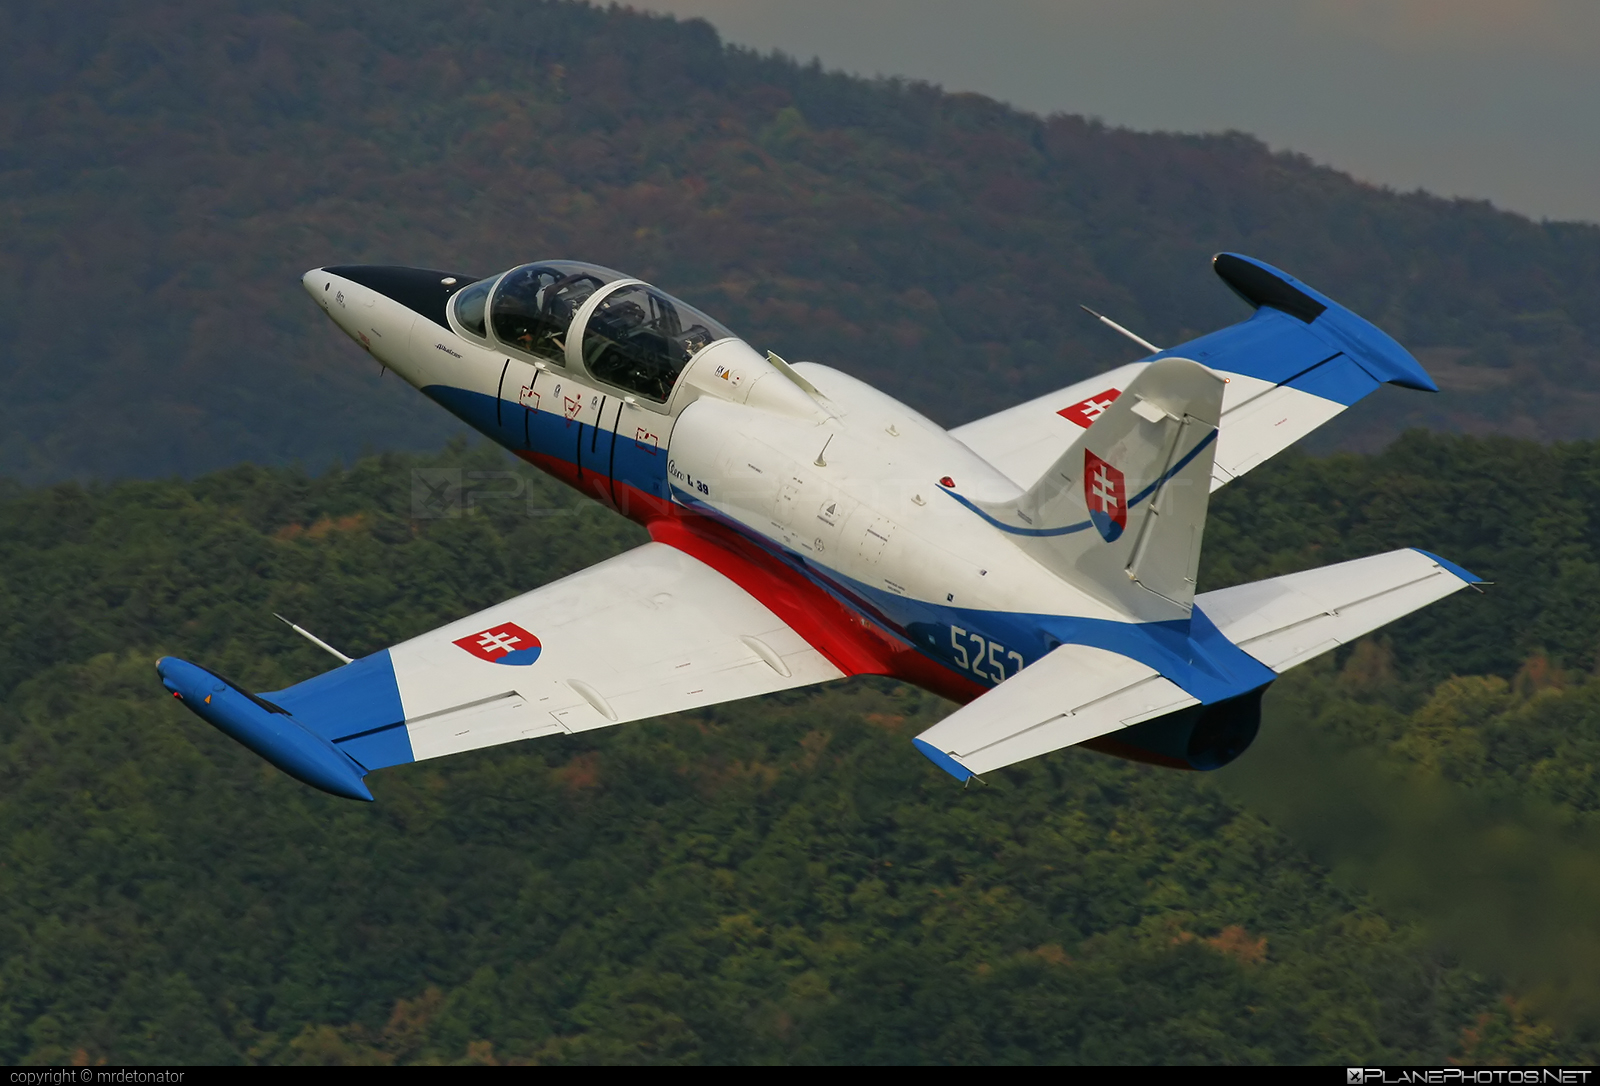 Aero L-39CM Albatros - 5253 operated by Vzdušné sily OS SR (Slovak Air Force) #aero #aerol39 #aerol39albatros #aerol39cmalbatros #albatros #l39 #l39cm #l39cmalbatros #slovakairforce #vzdusnesilyossr